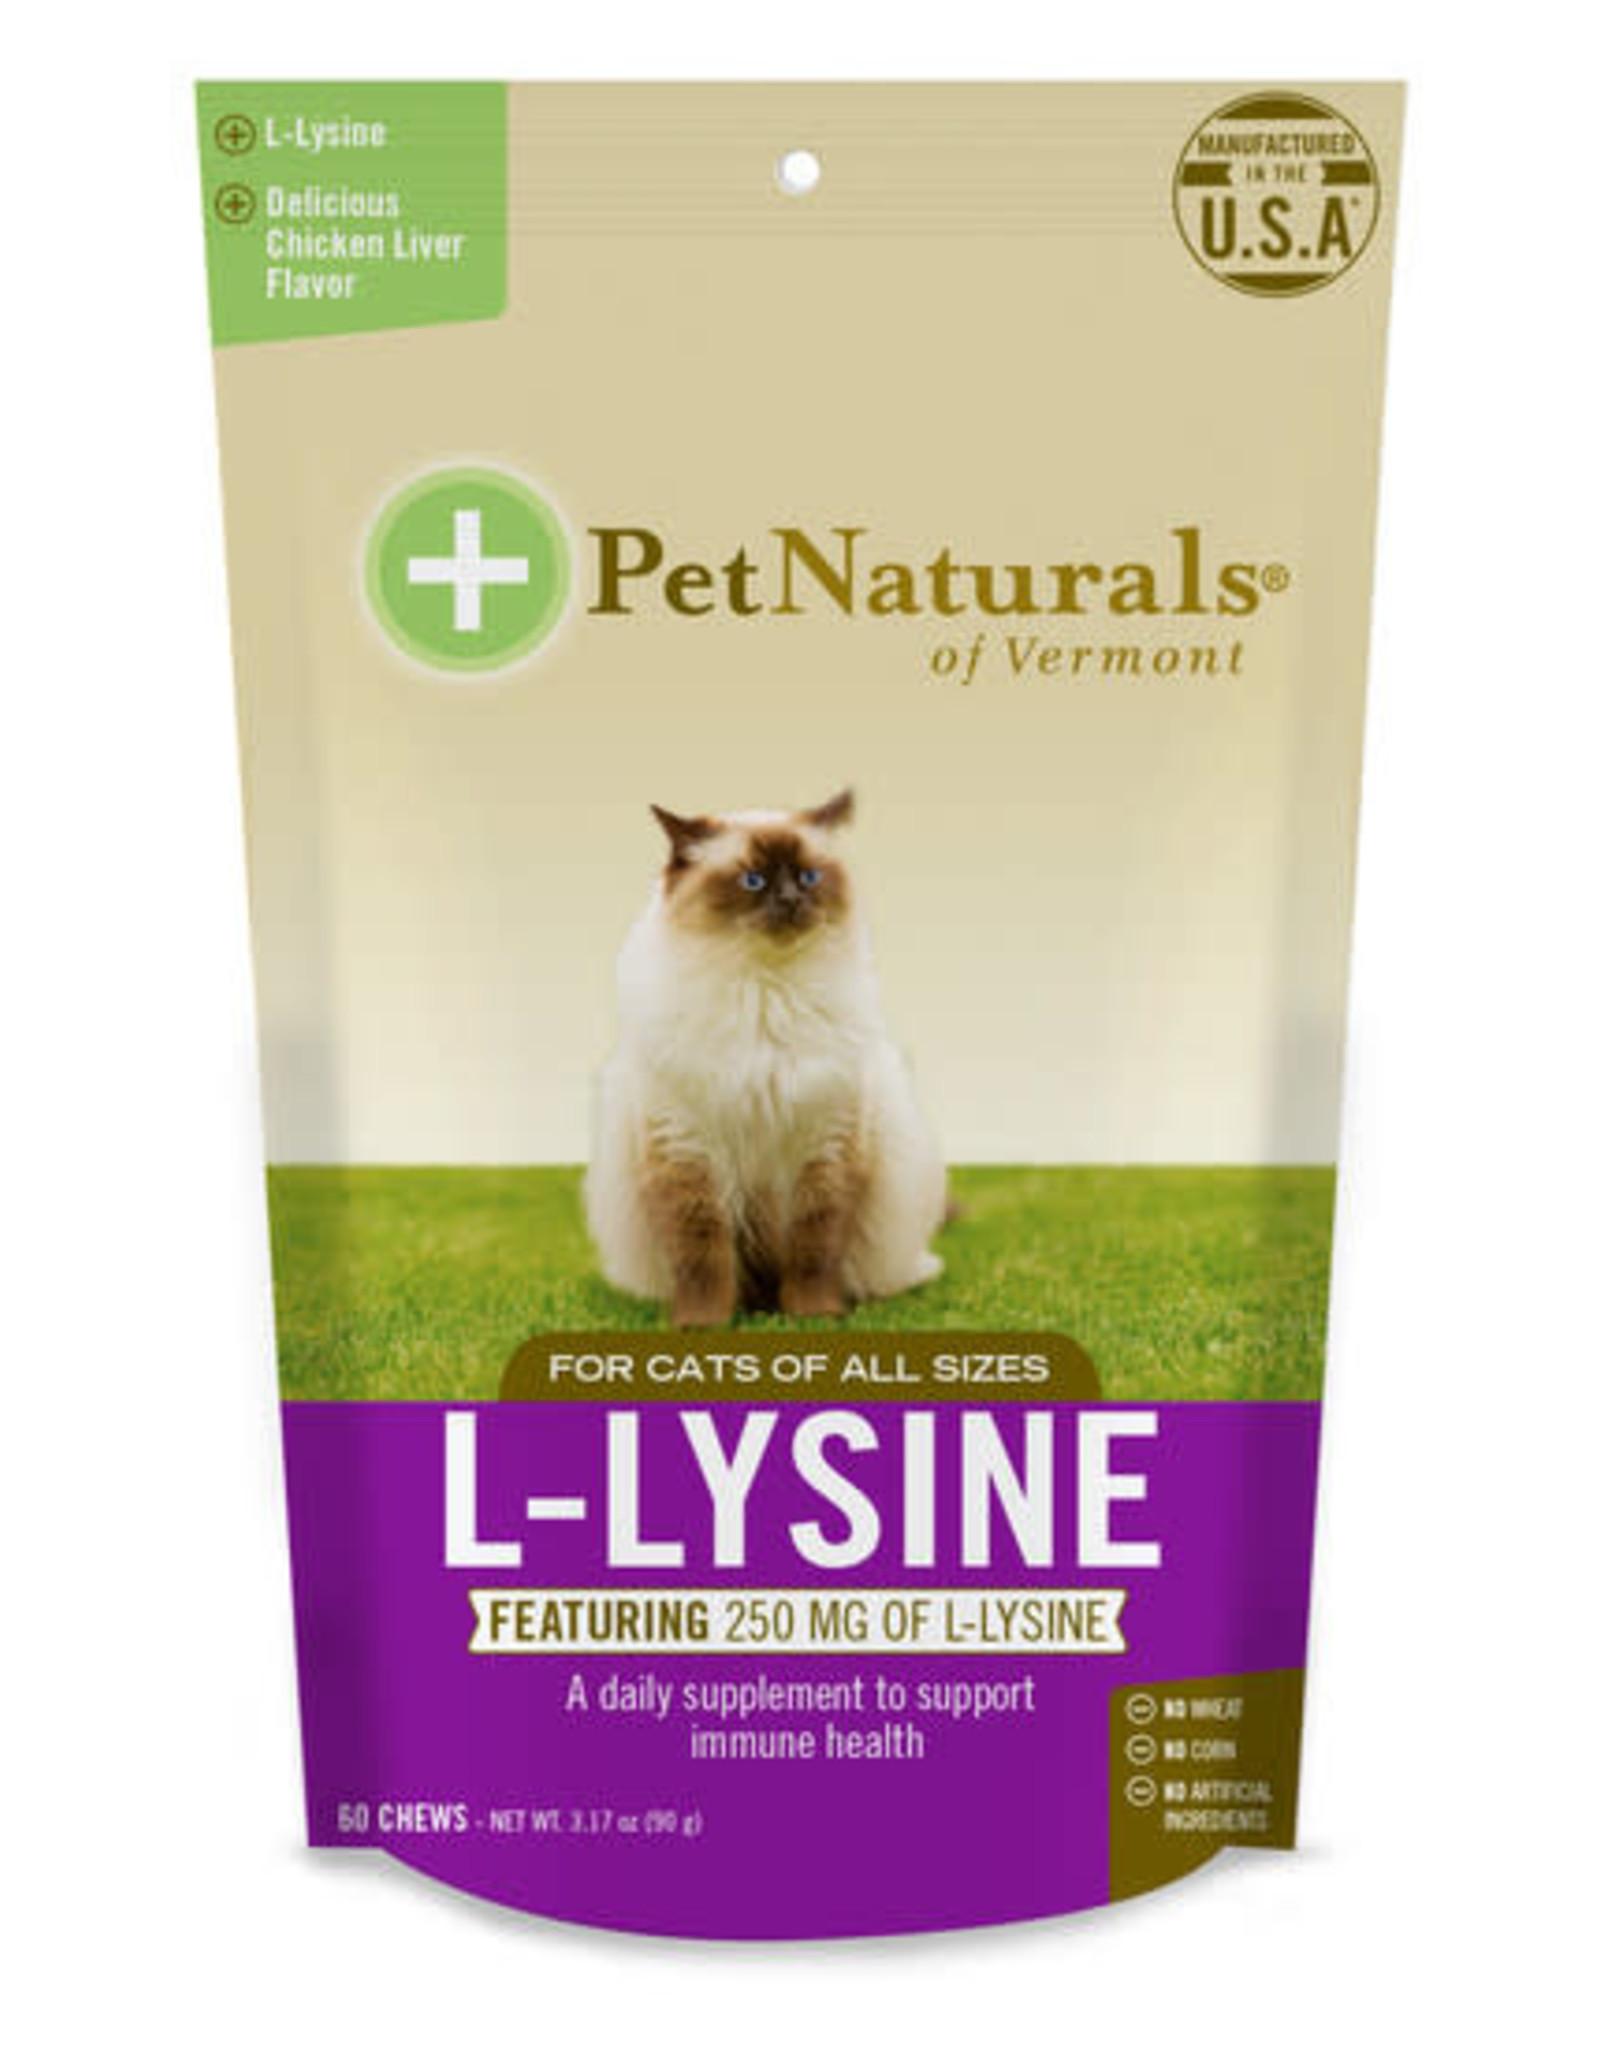 Pet Naturals of Vermont L-Lysine for Cats 60ct